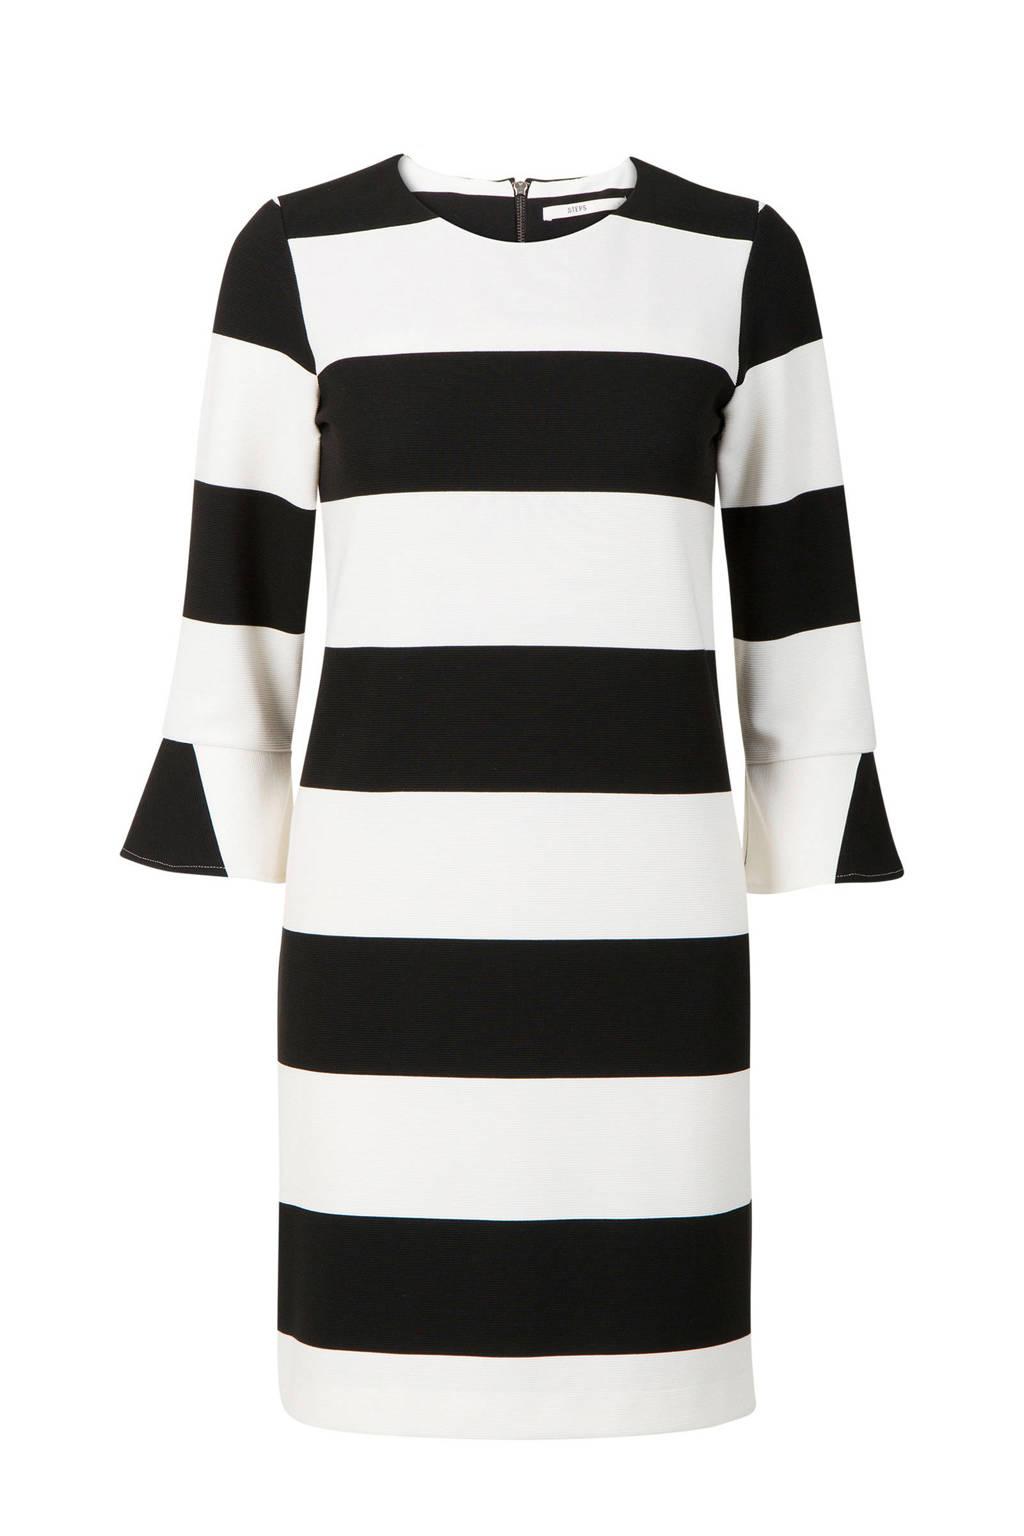 005353796bcce5 Steps gestreepte jurk zwart wit